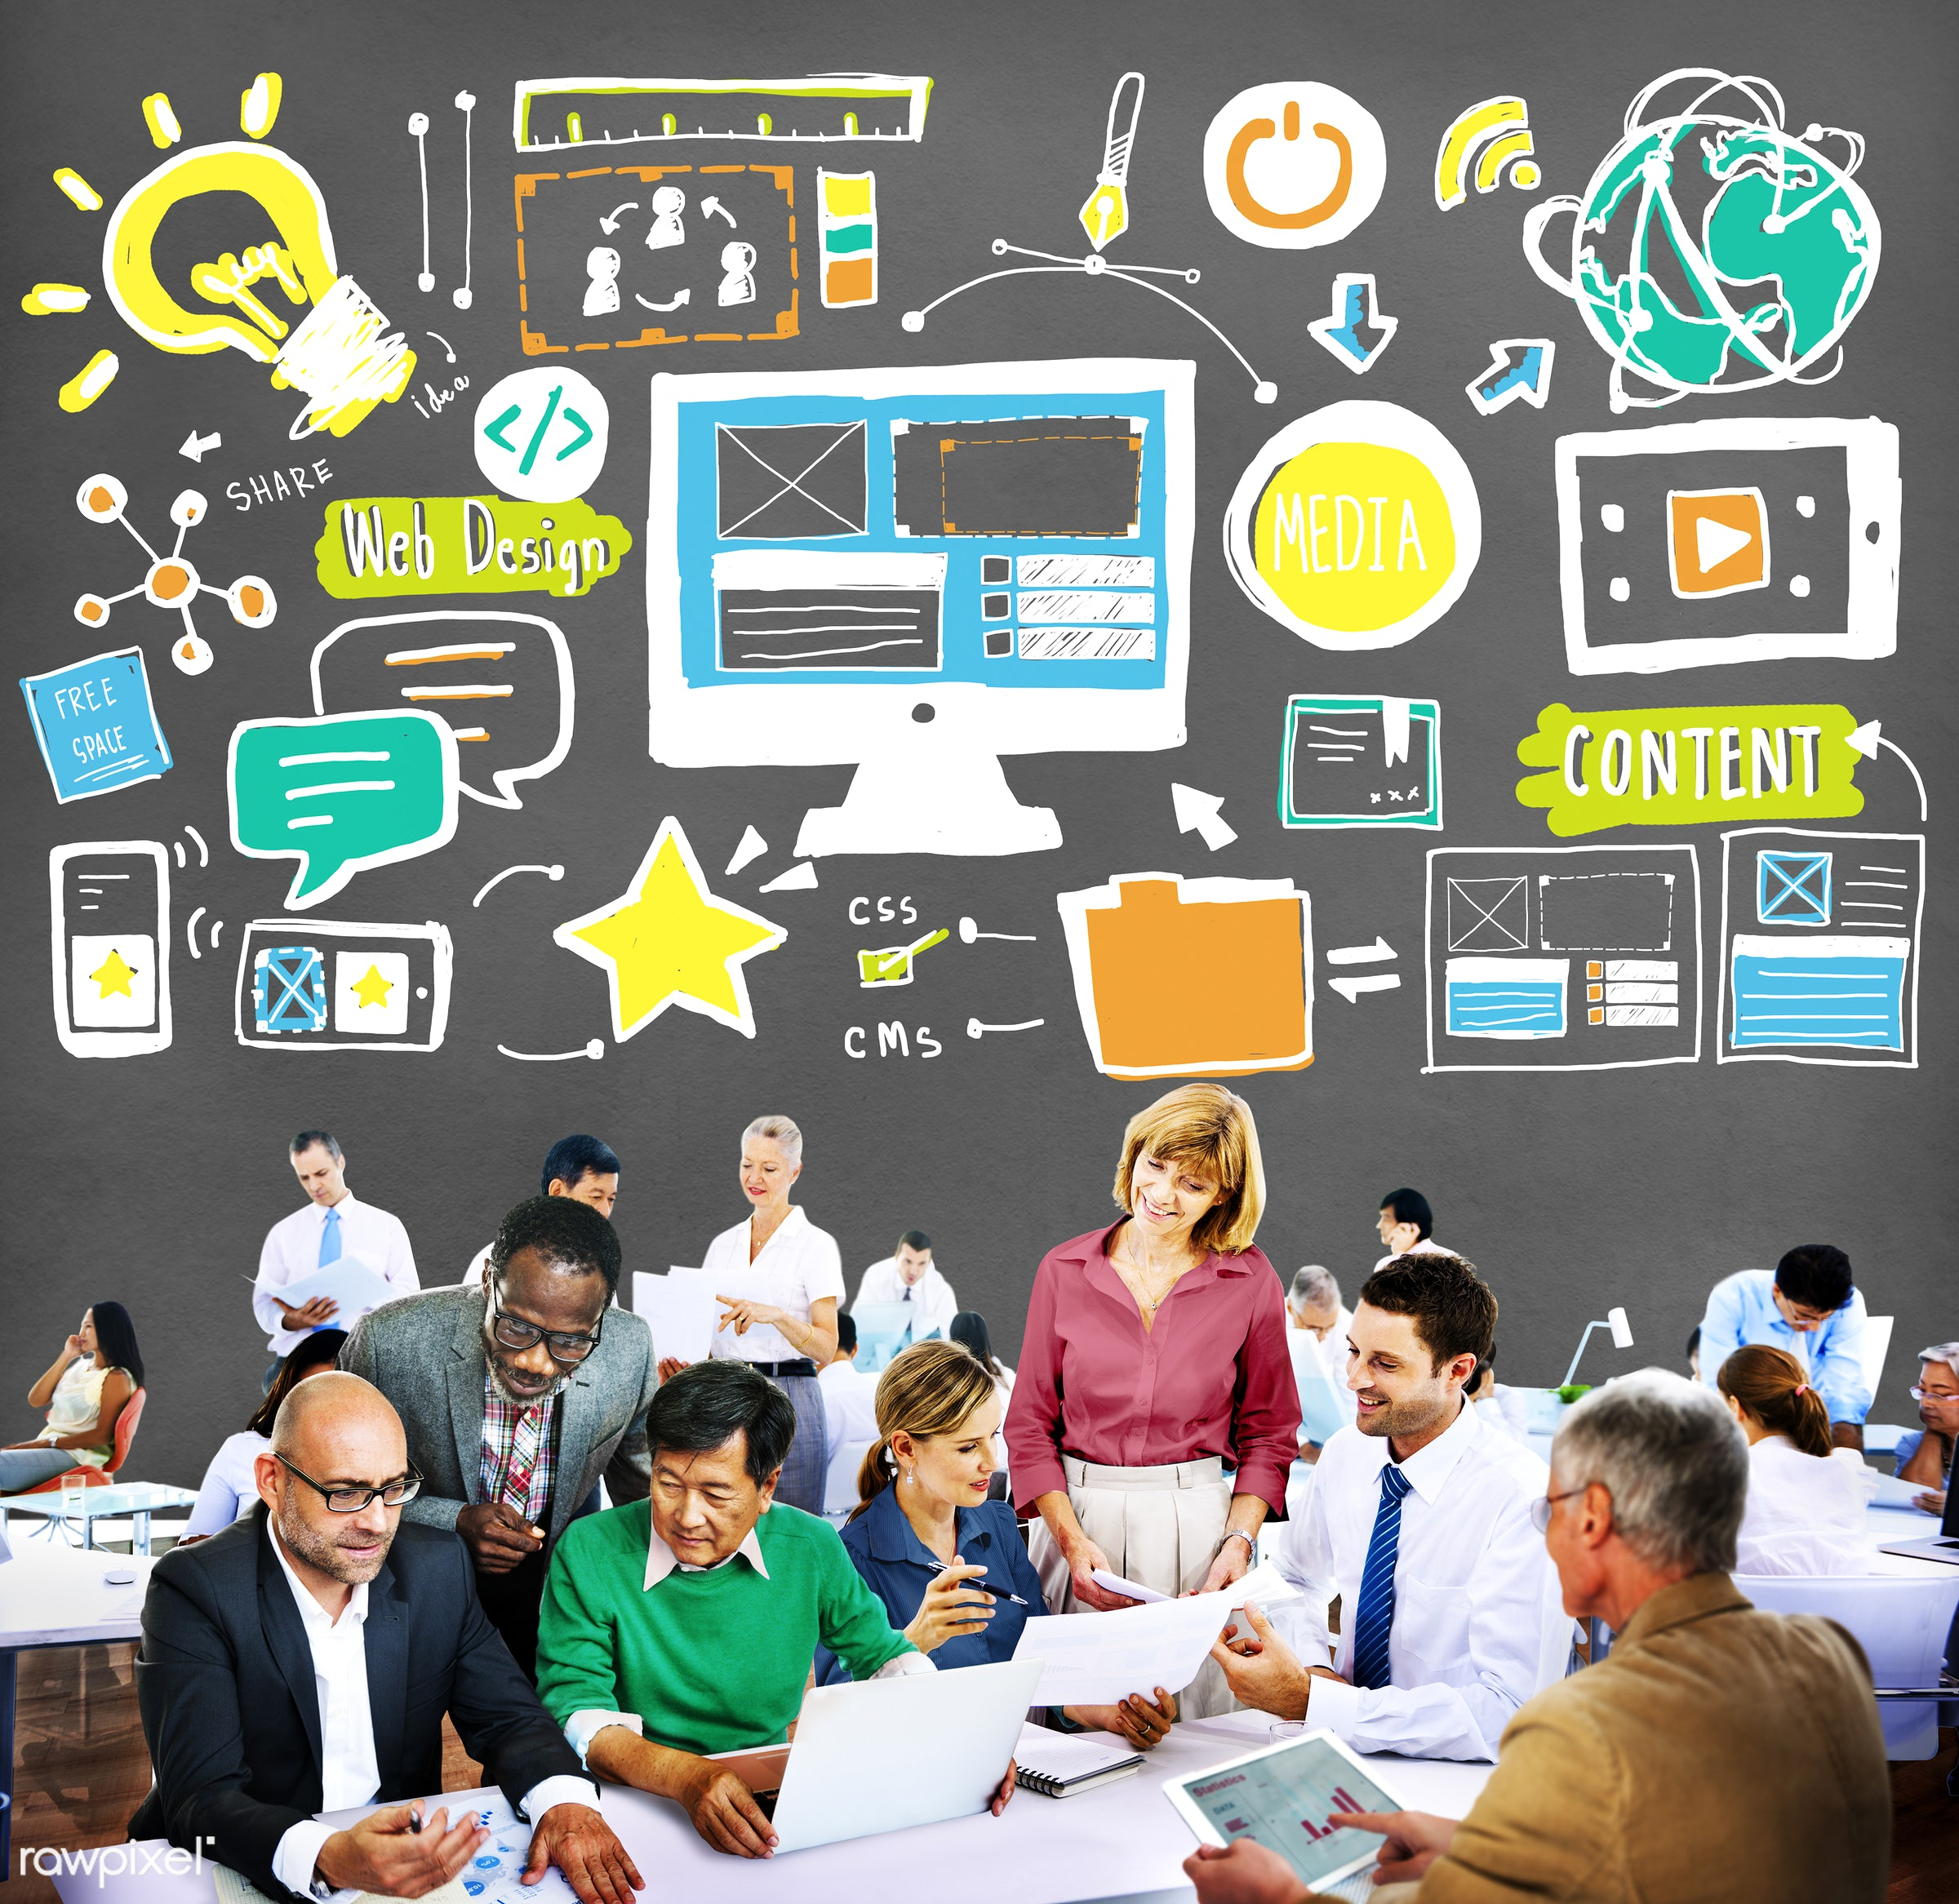 analysis, analytics, business, business people, businessmen, businesswomen, busy, communication, computer, content,...